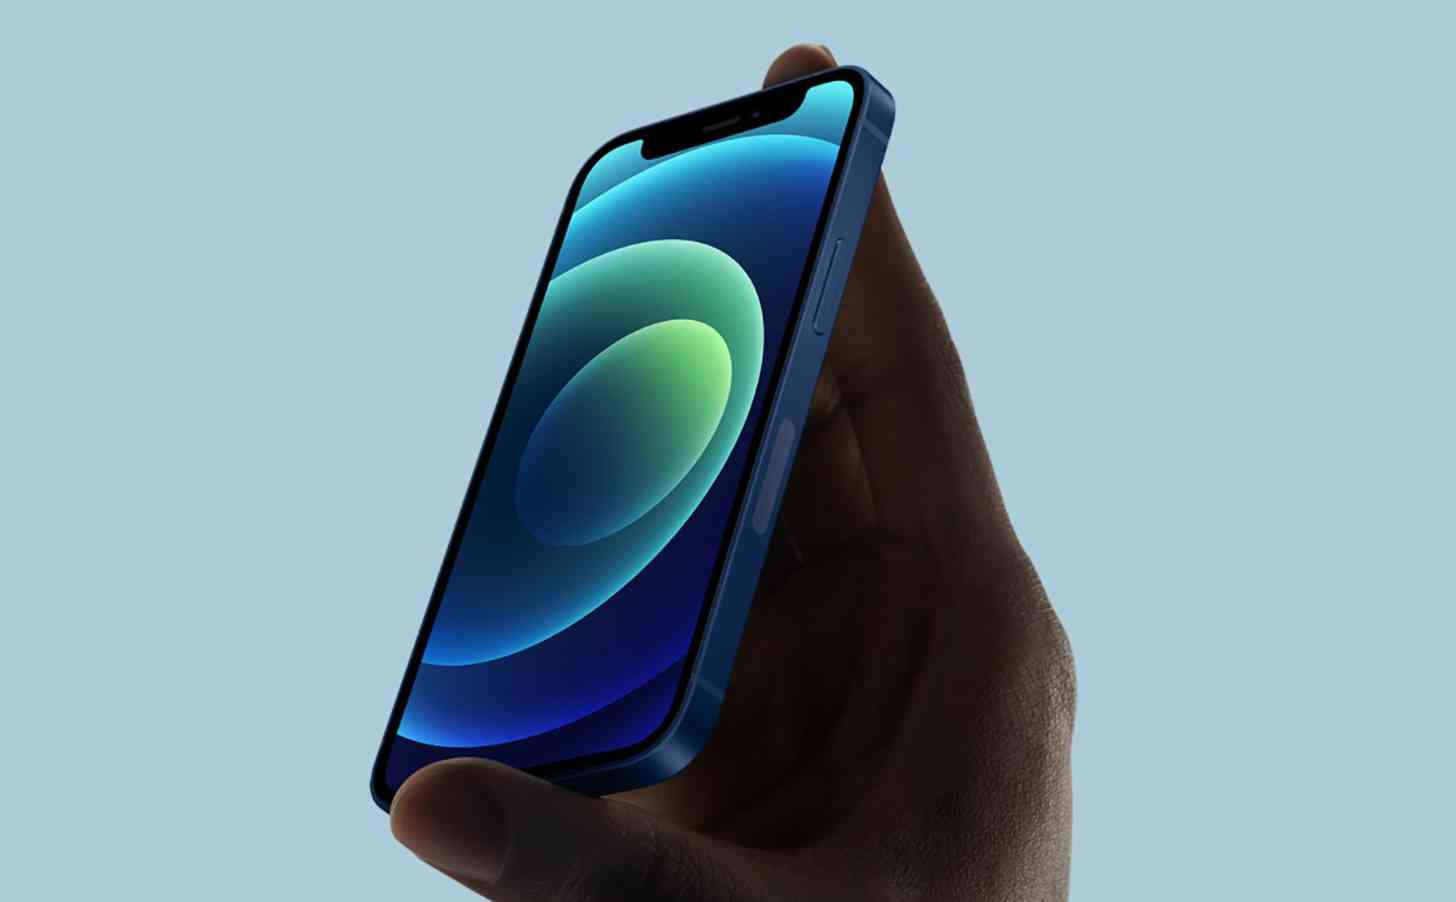 iPhone 12 mmWave 5G antenna